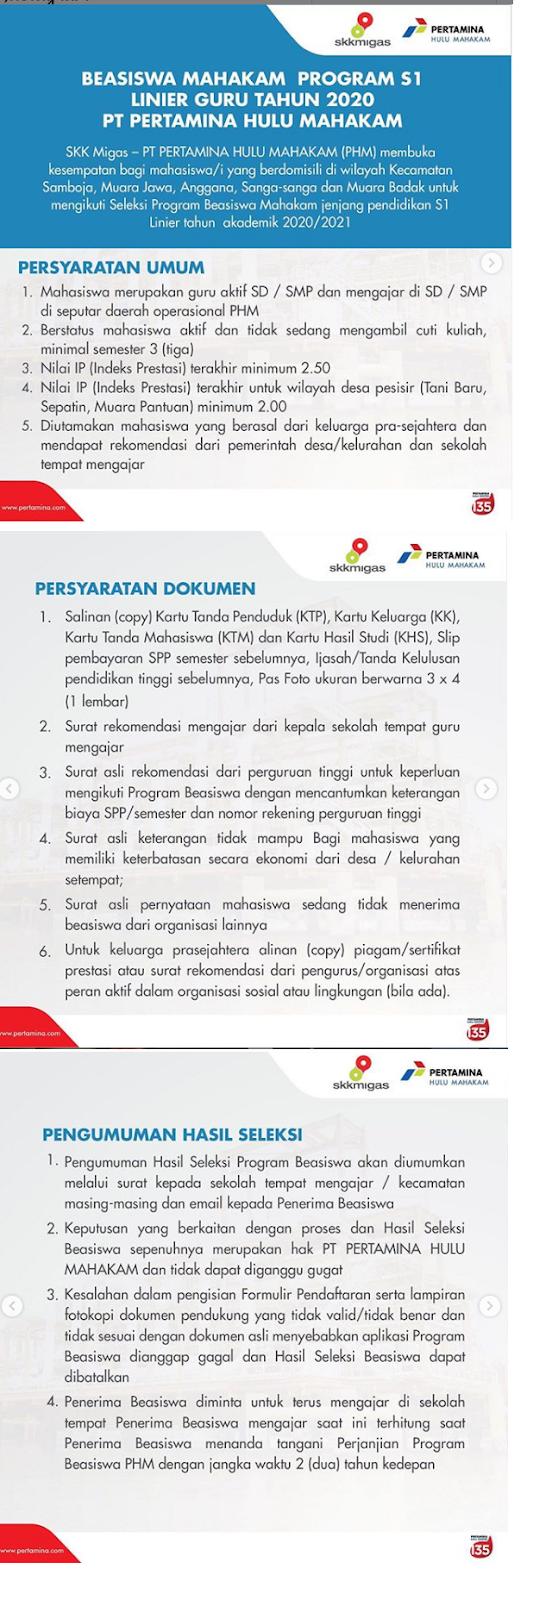 Penerimaan Seleksi Program Beasiswa PT PERTAMINA HULU MAHAKAM (PHM) Tingkat D3 D4 S1 S2 Mei 2020